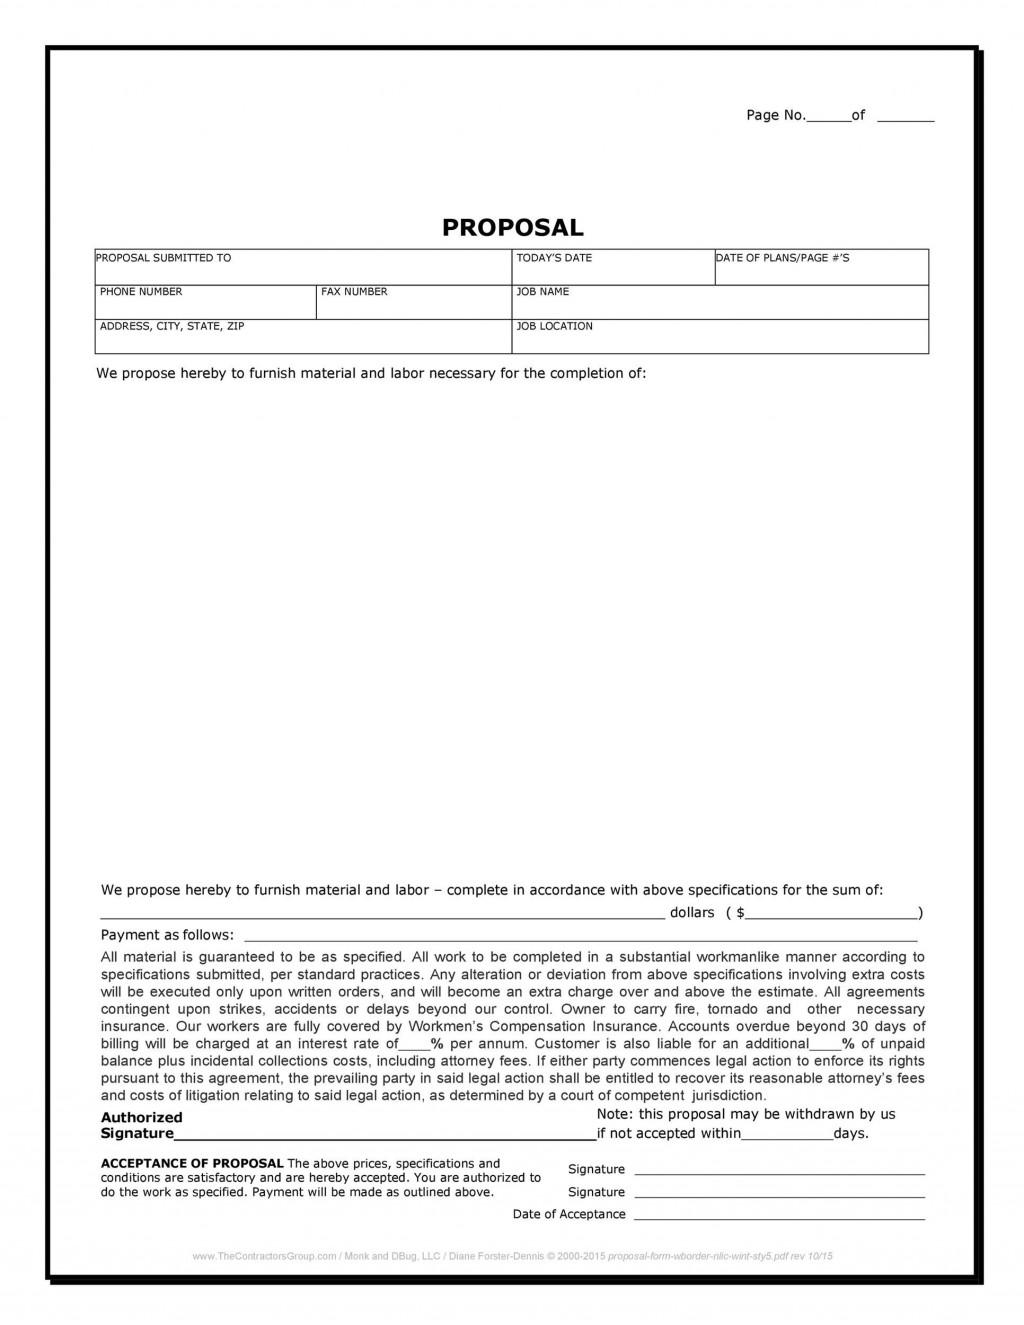 007 Awful Free Construction Proposal Template Idea  Bid Contractor WordLarge